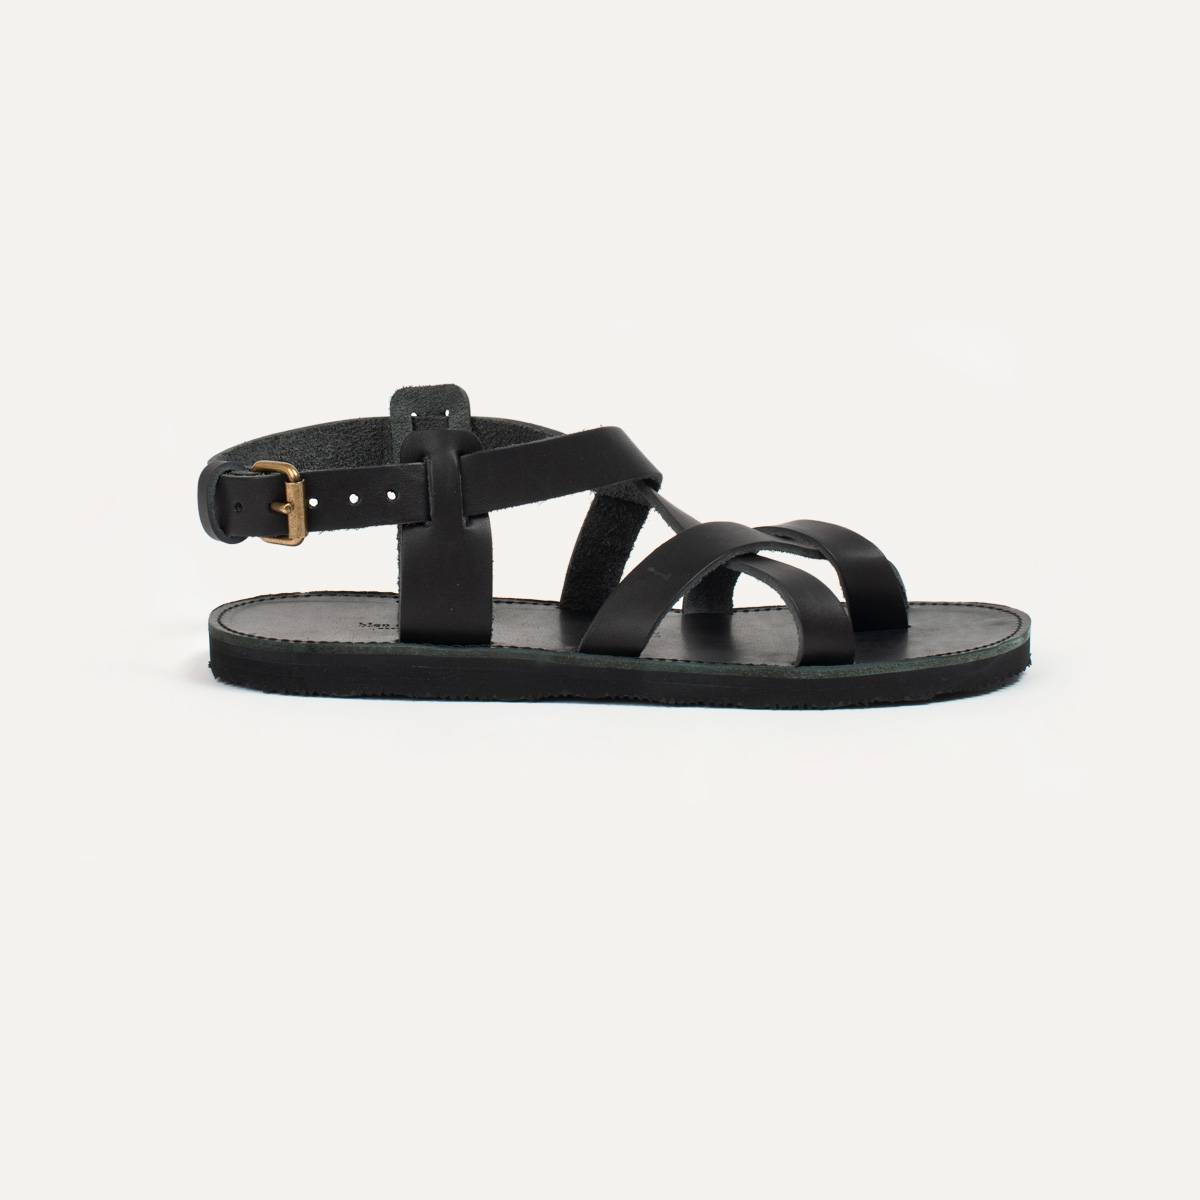 Lhassa leather sandals - Black (image n°1)